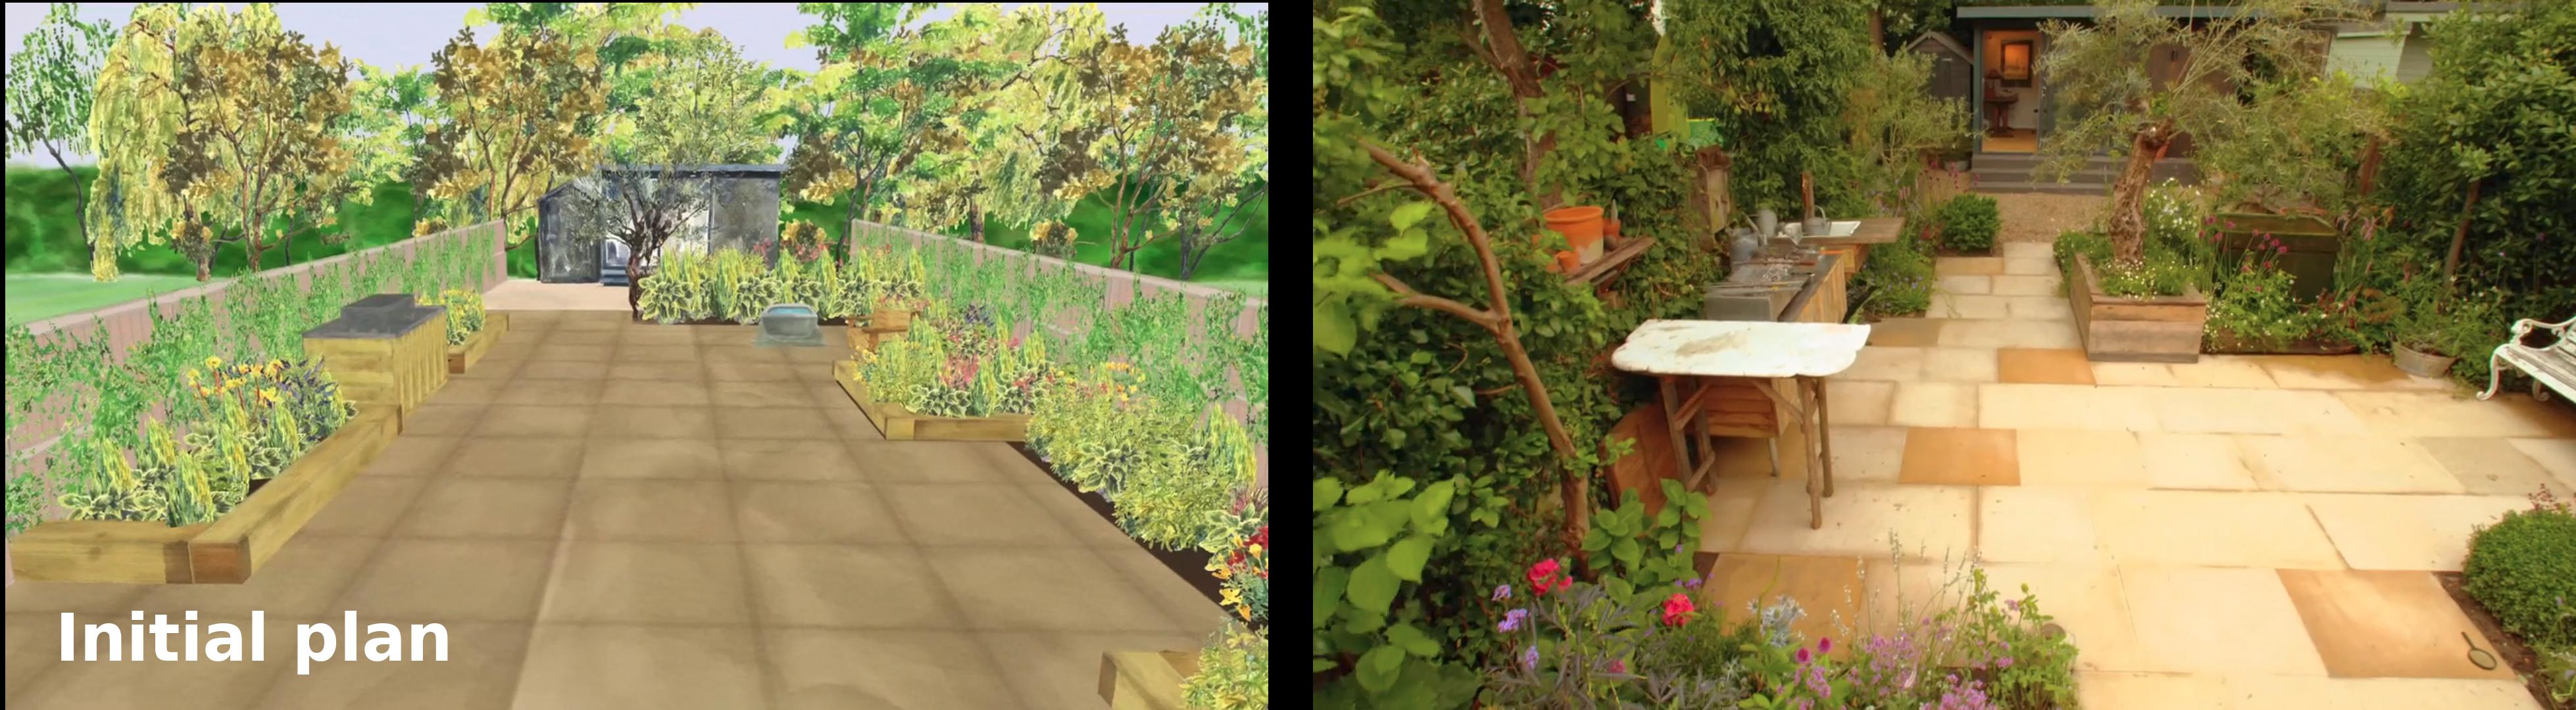 Big Dreams, Small Spaces - Italian Garden plan by Monty Don next to ...